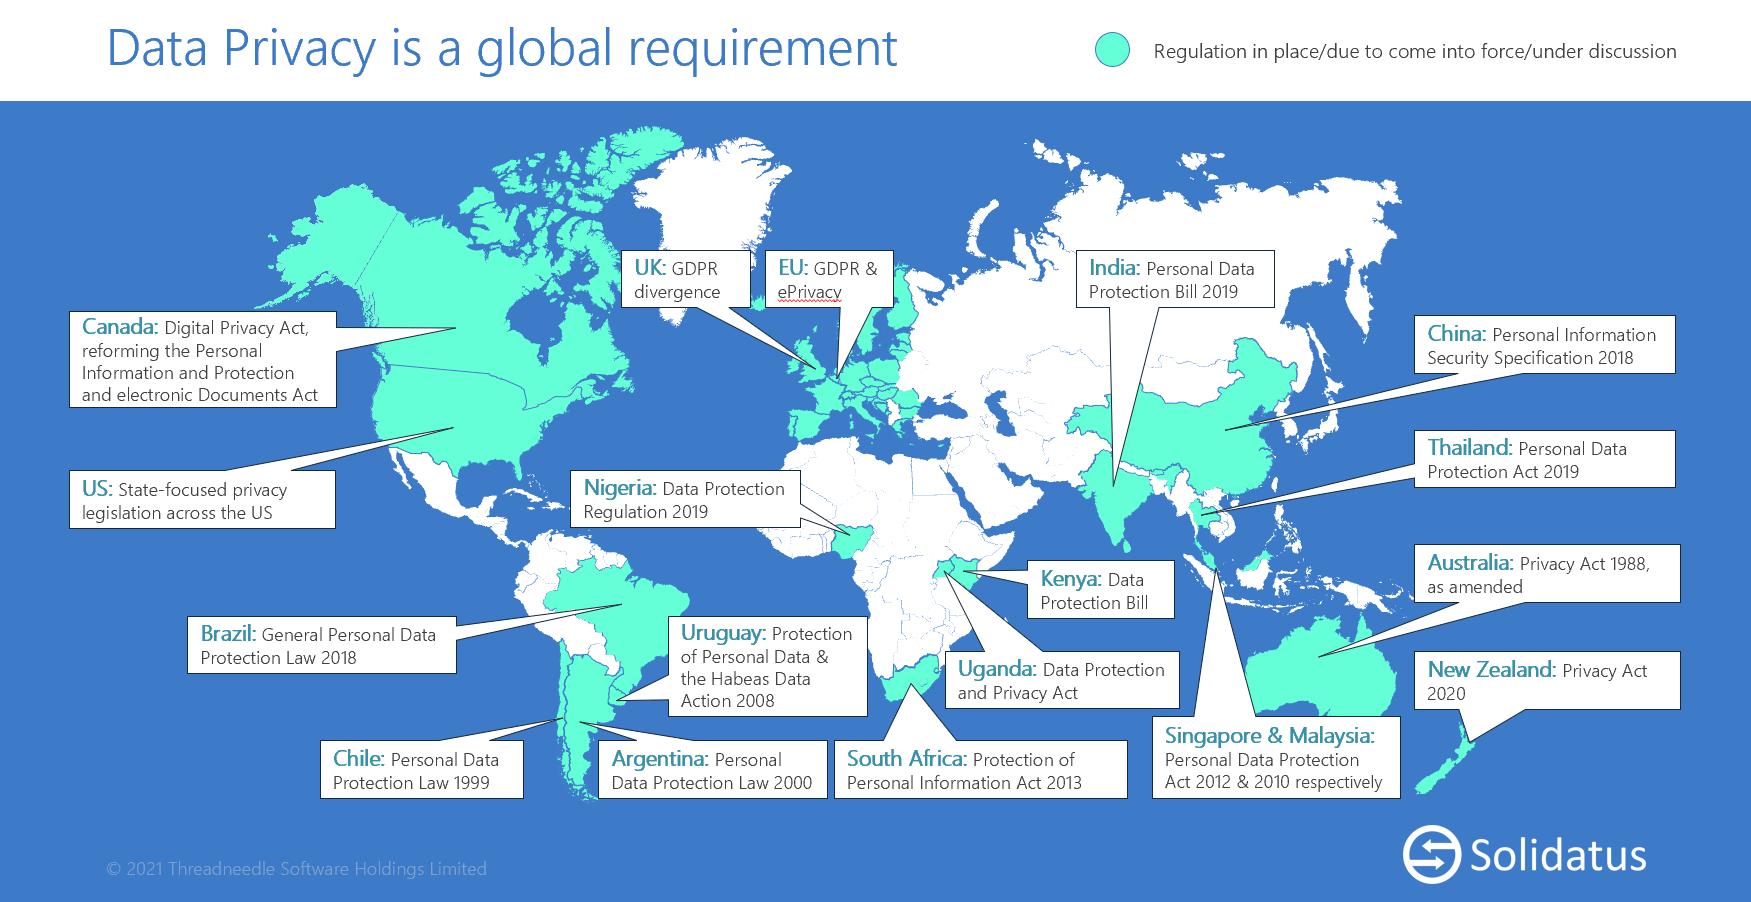 Solidatus Global Data Privacy Regulations Worldmap